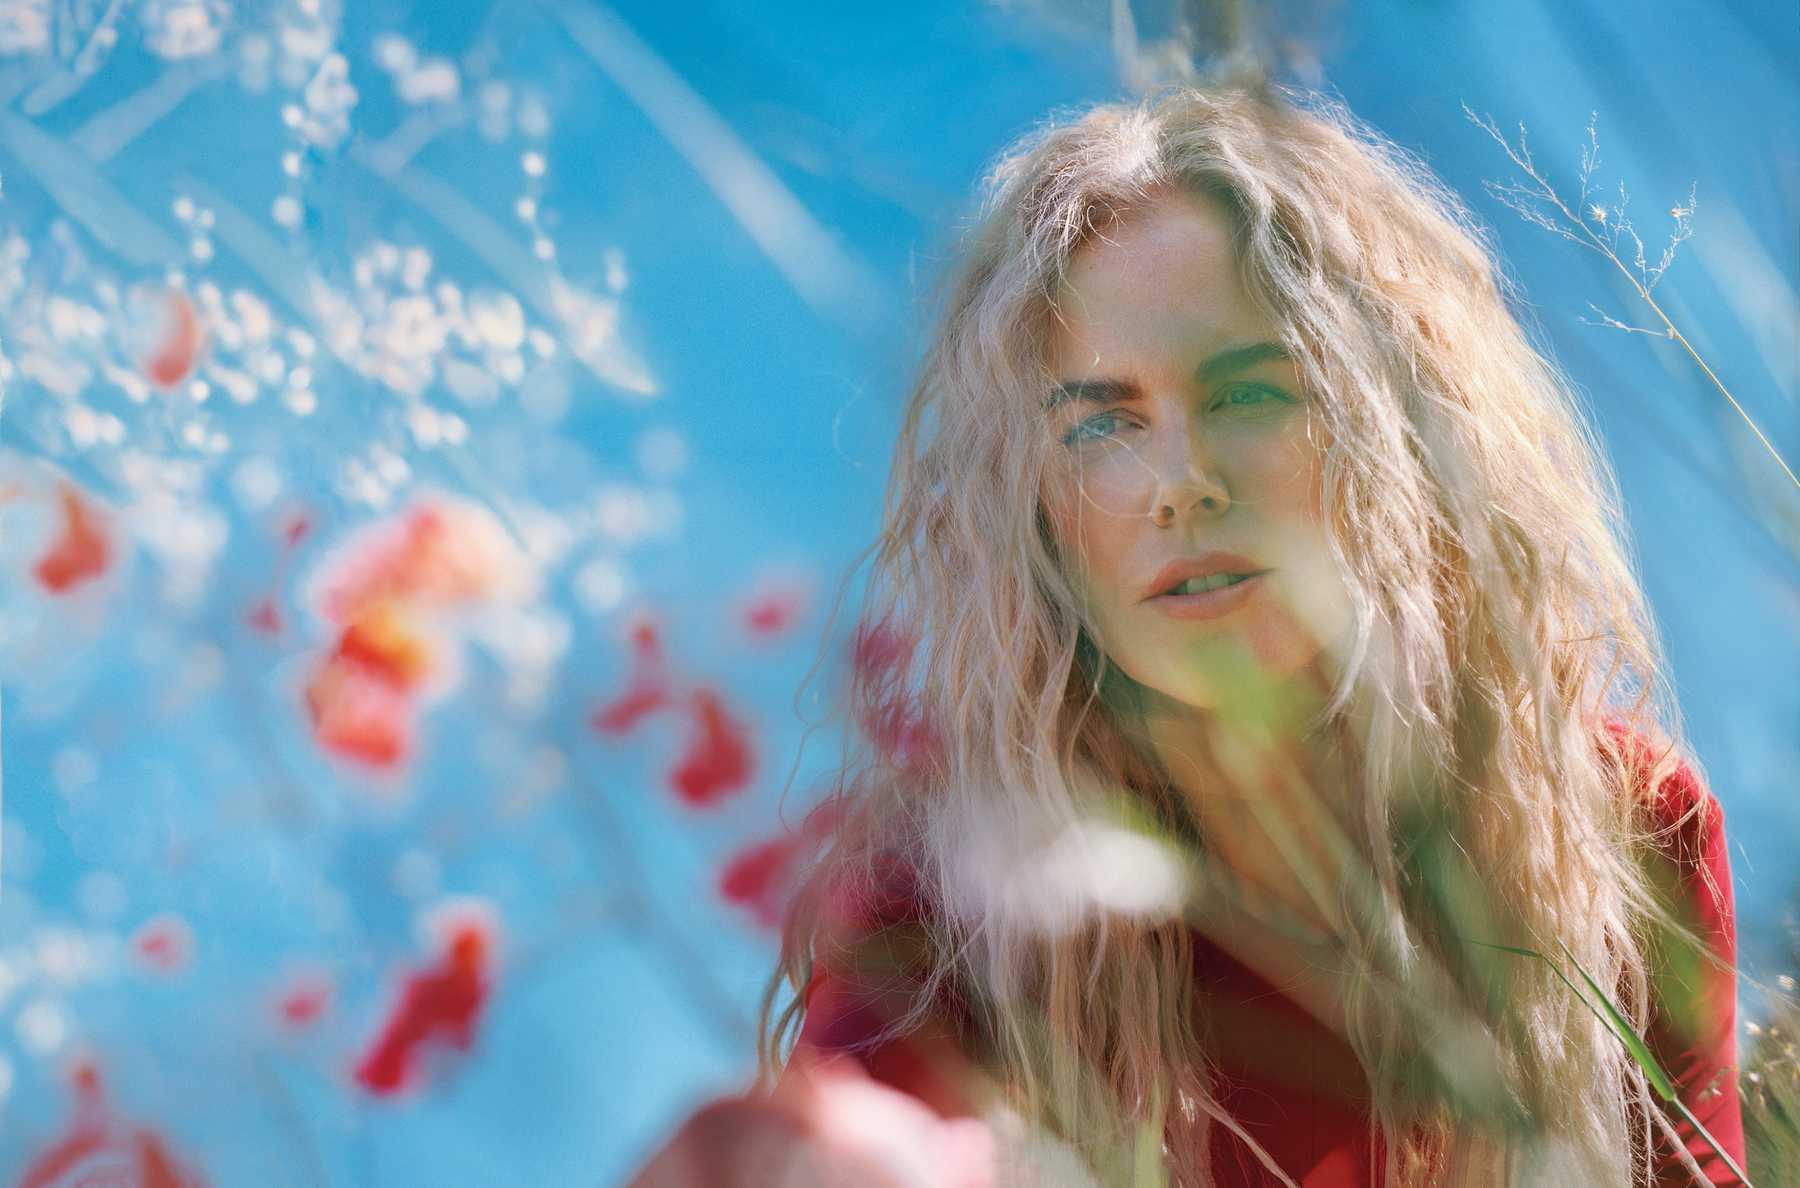 Nicole-Kidman-Allure-December-2018-January-20195.jpg